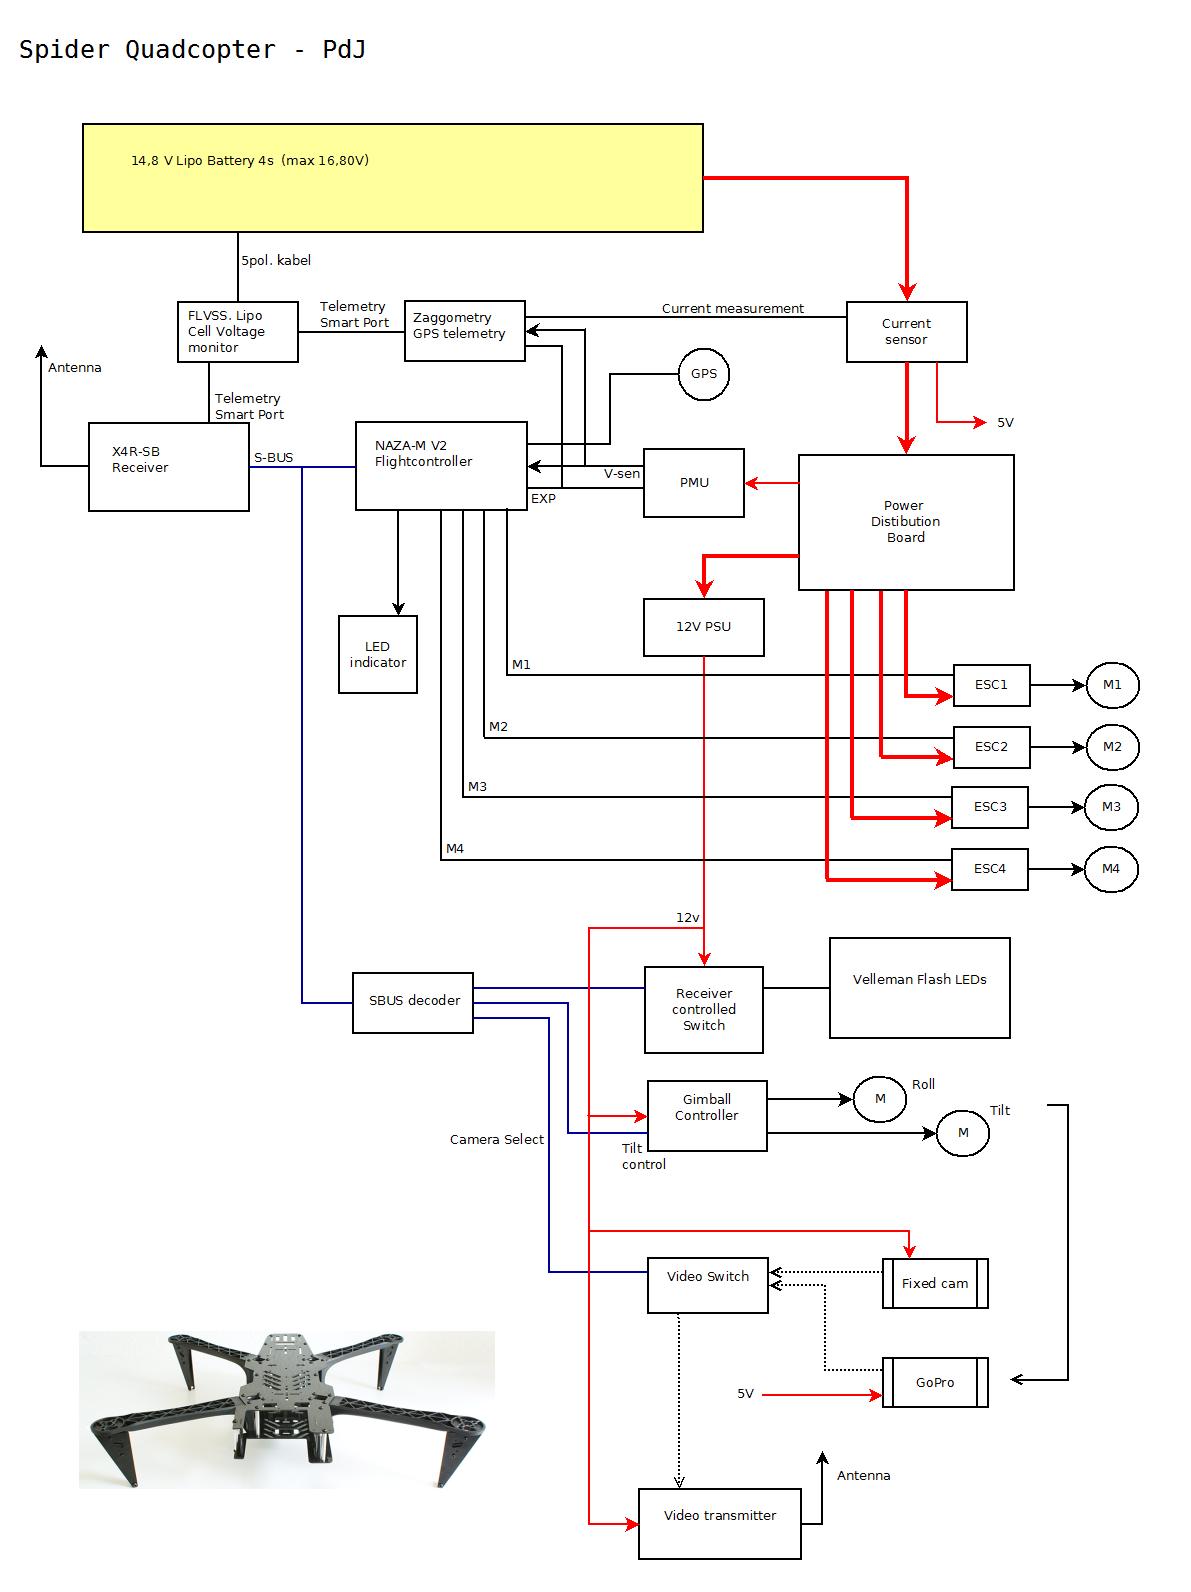 Quadcopter update